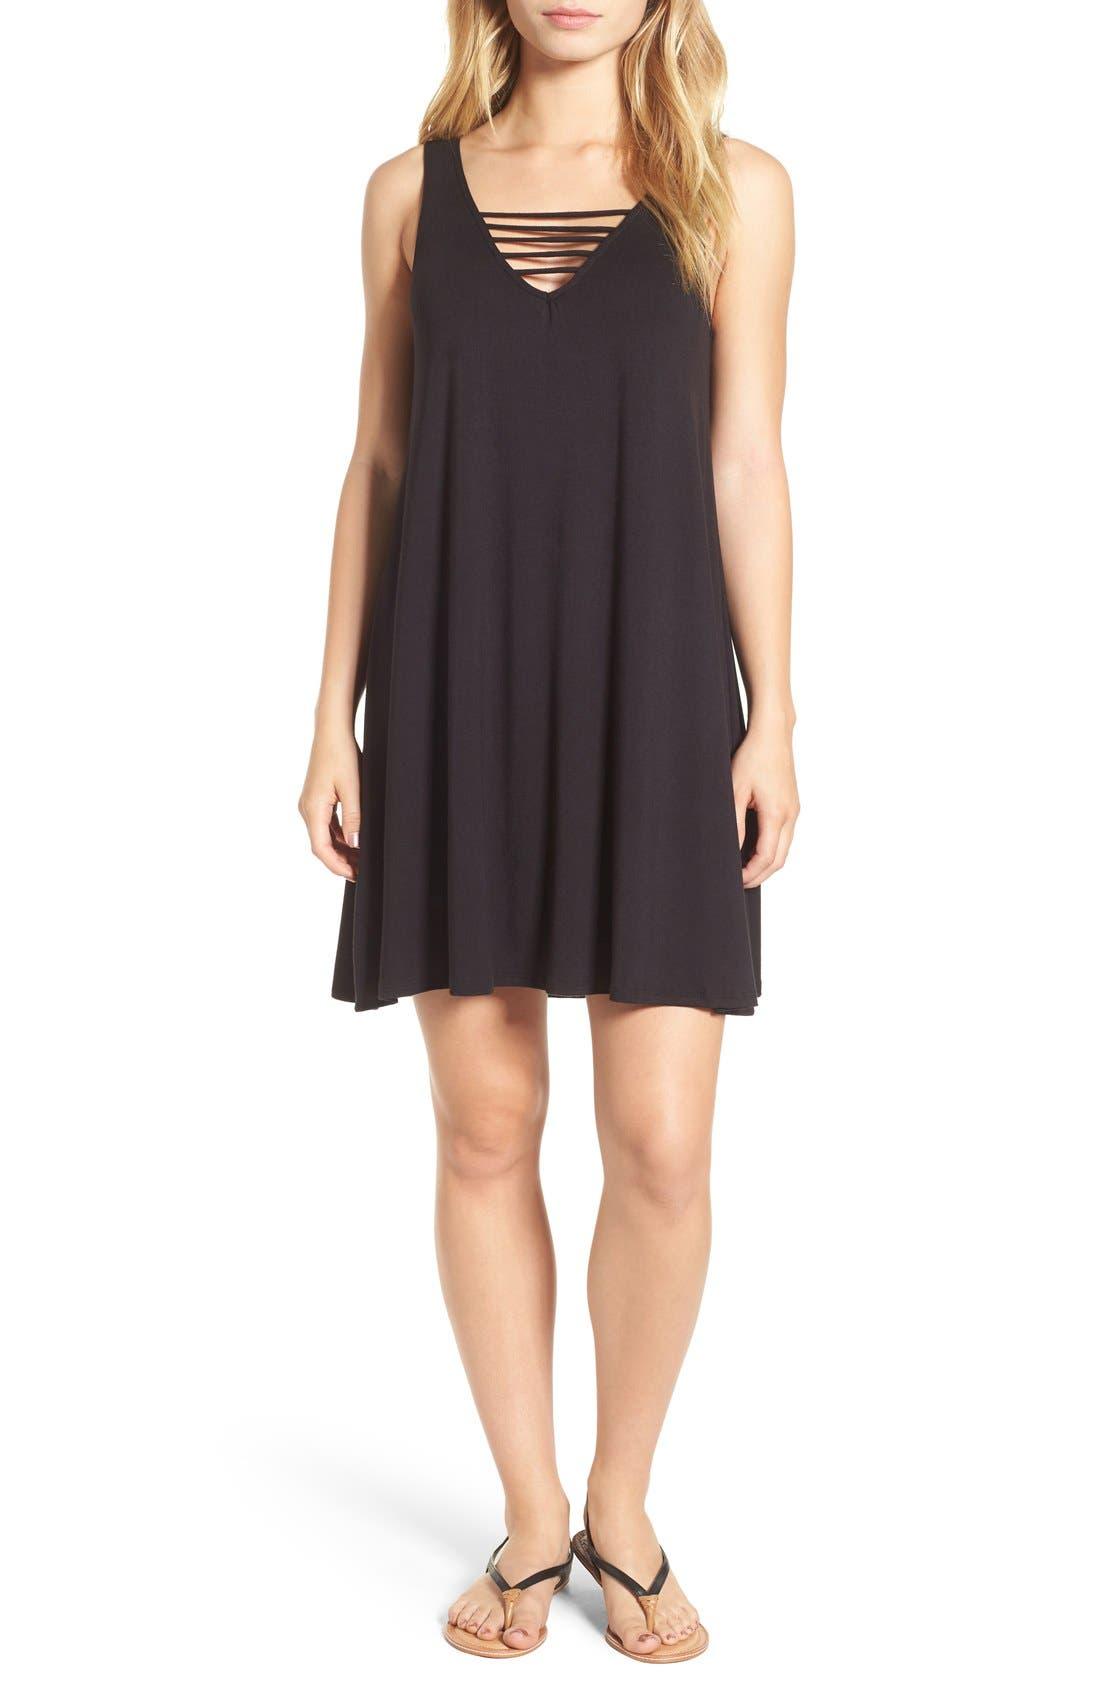 Alternate Image 1 Selected - Socialite 'Serena' Strappy Tank Dress